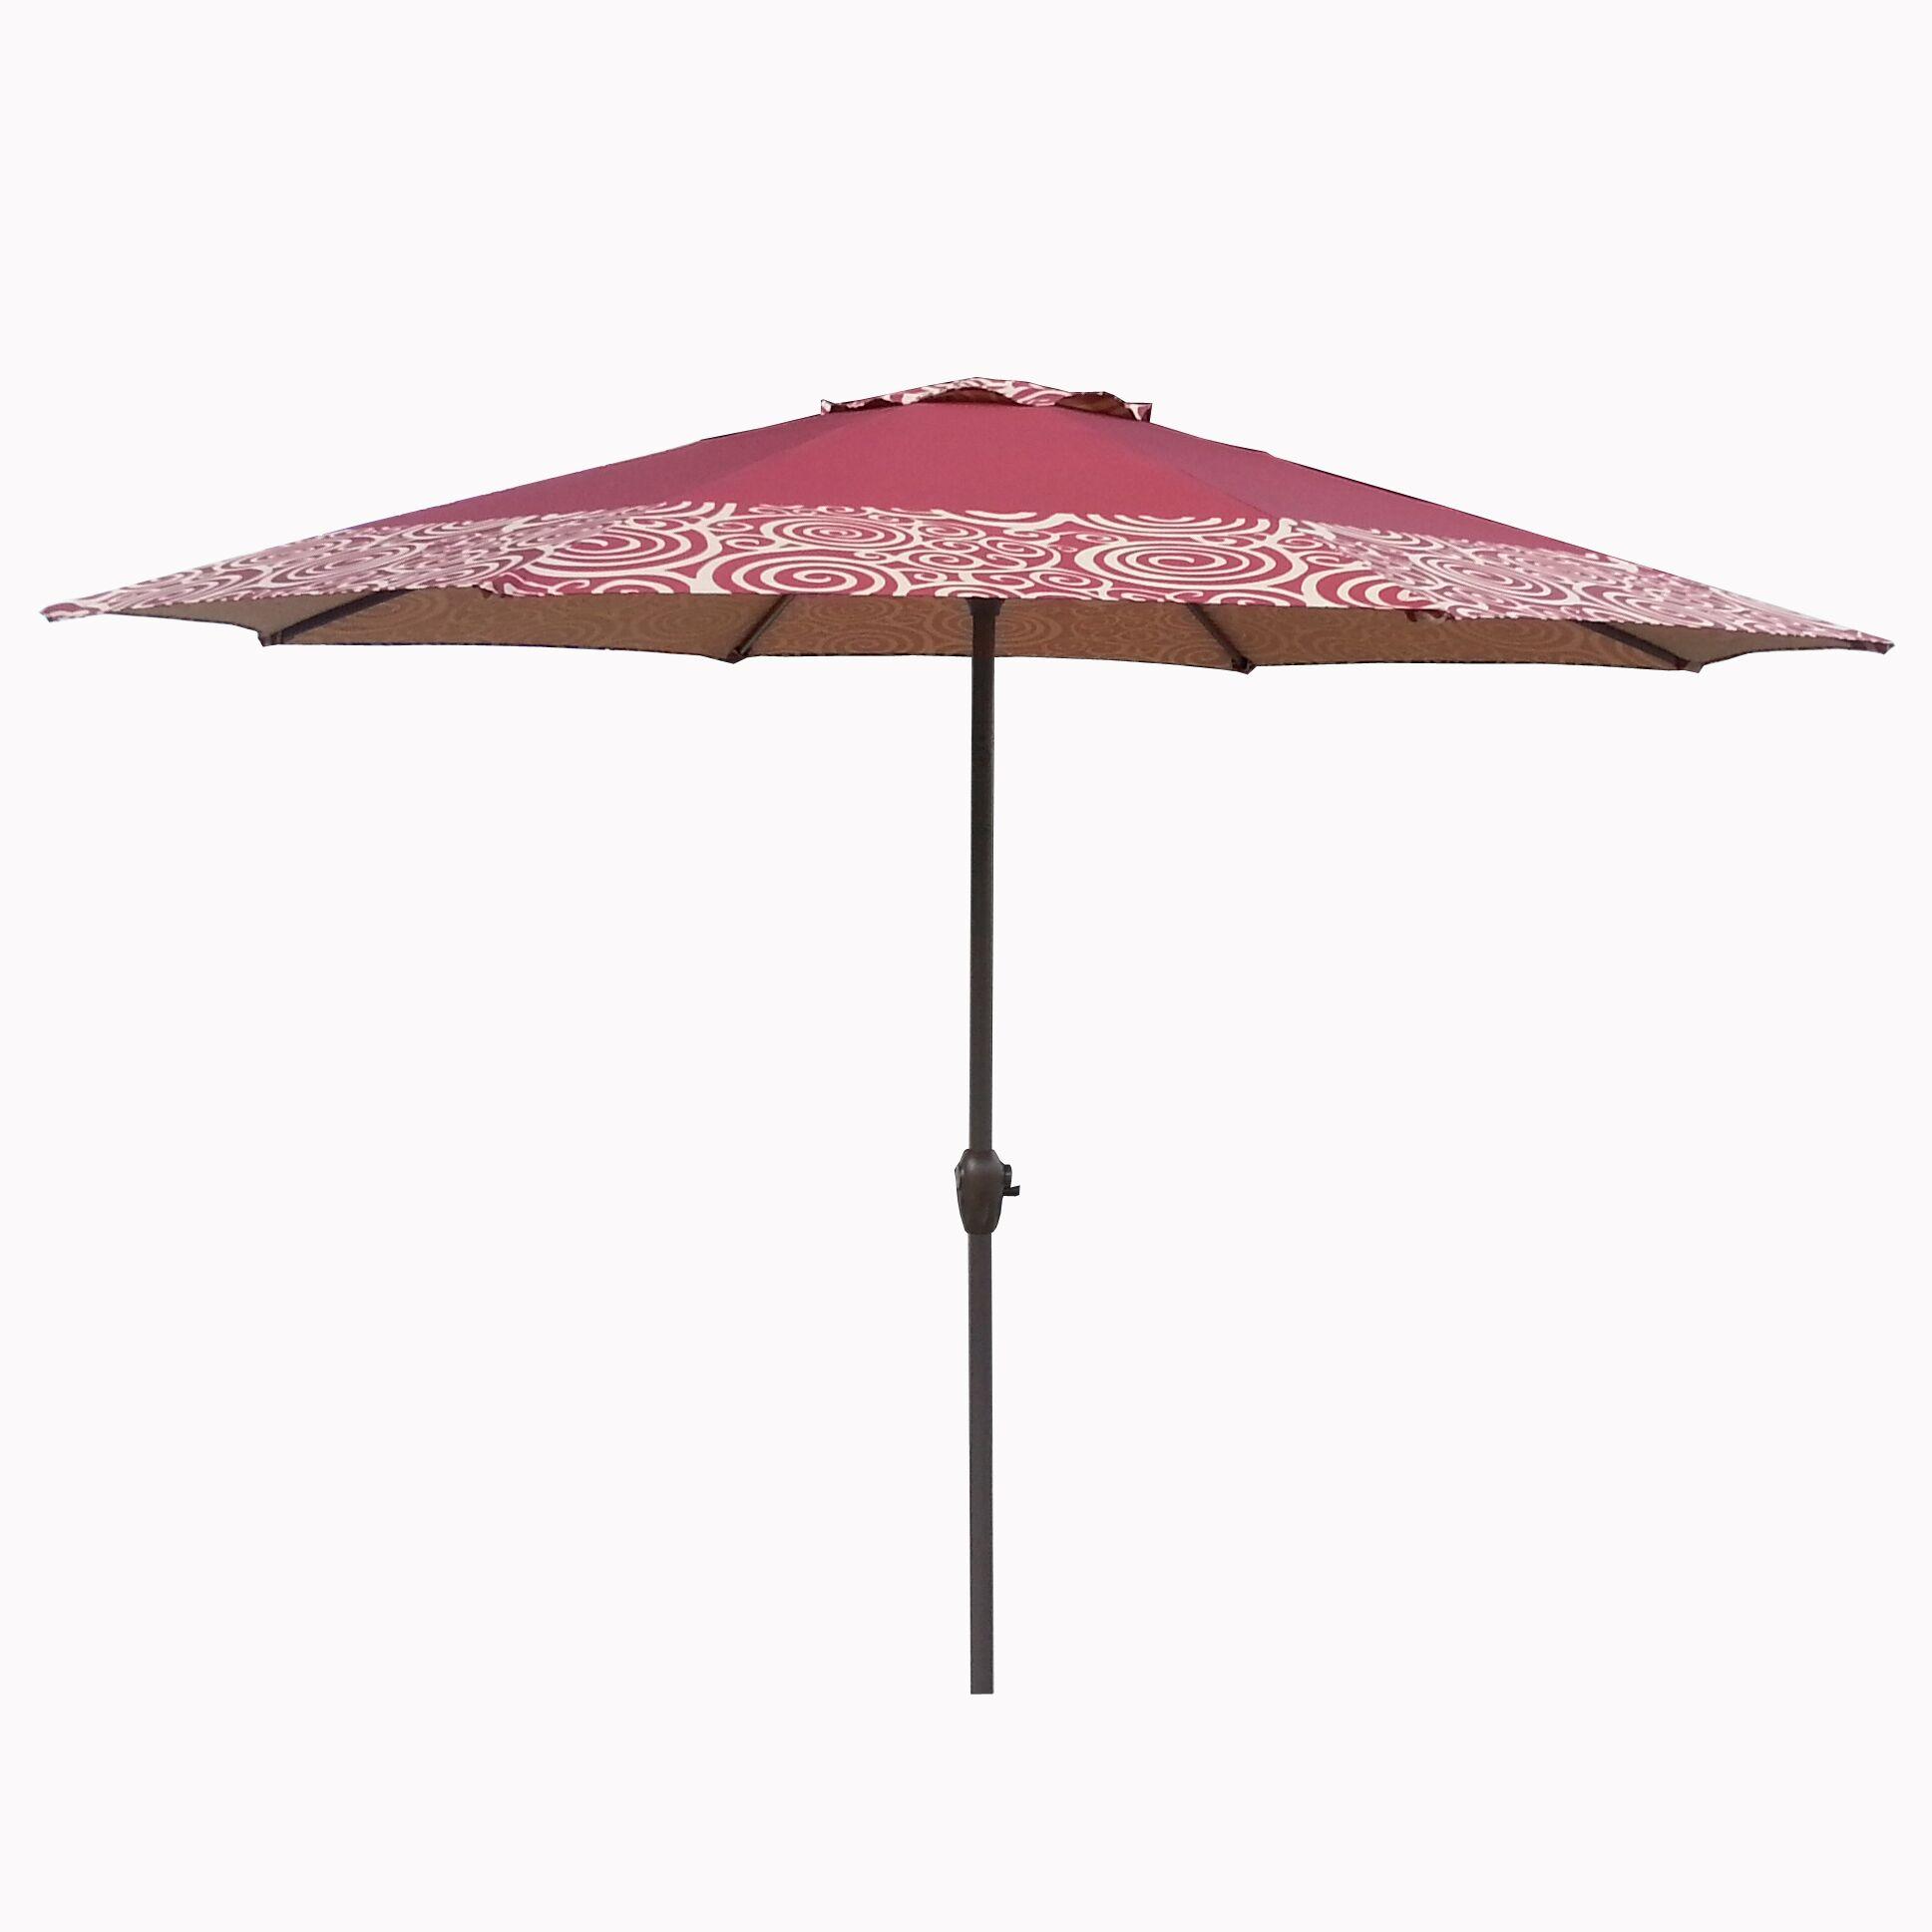 9' Market Umbrella Fabric: Burgundy